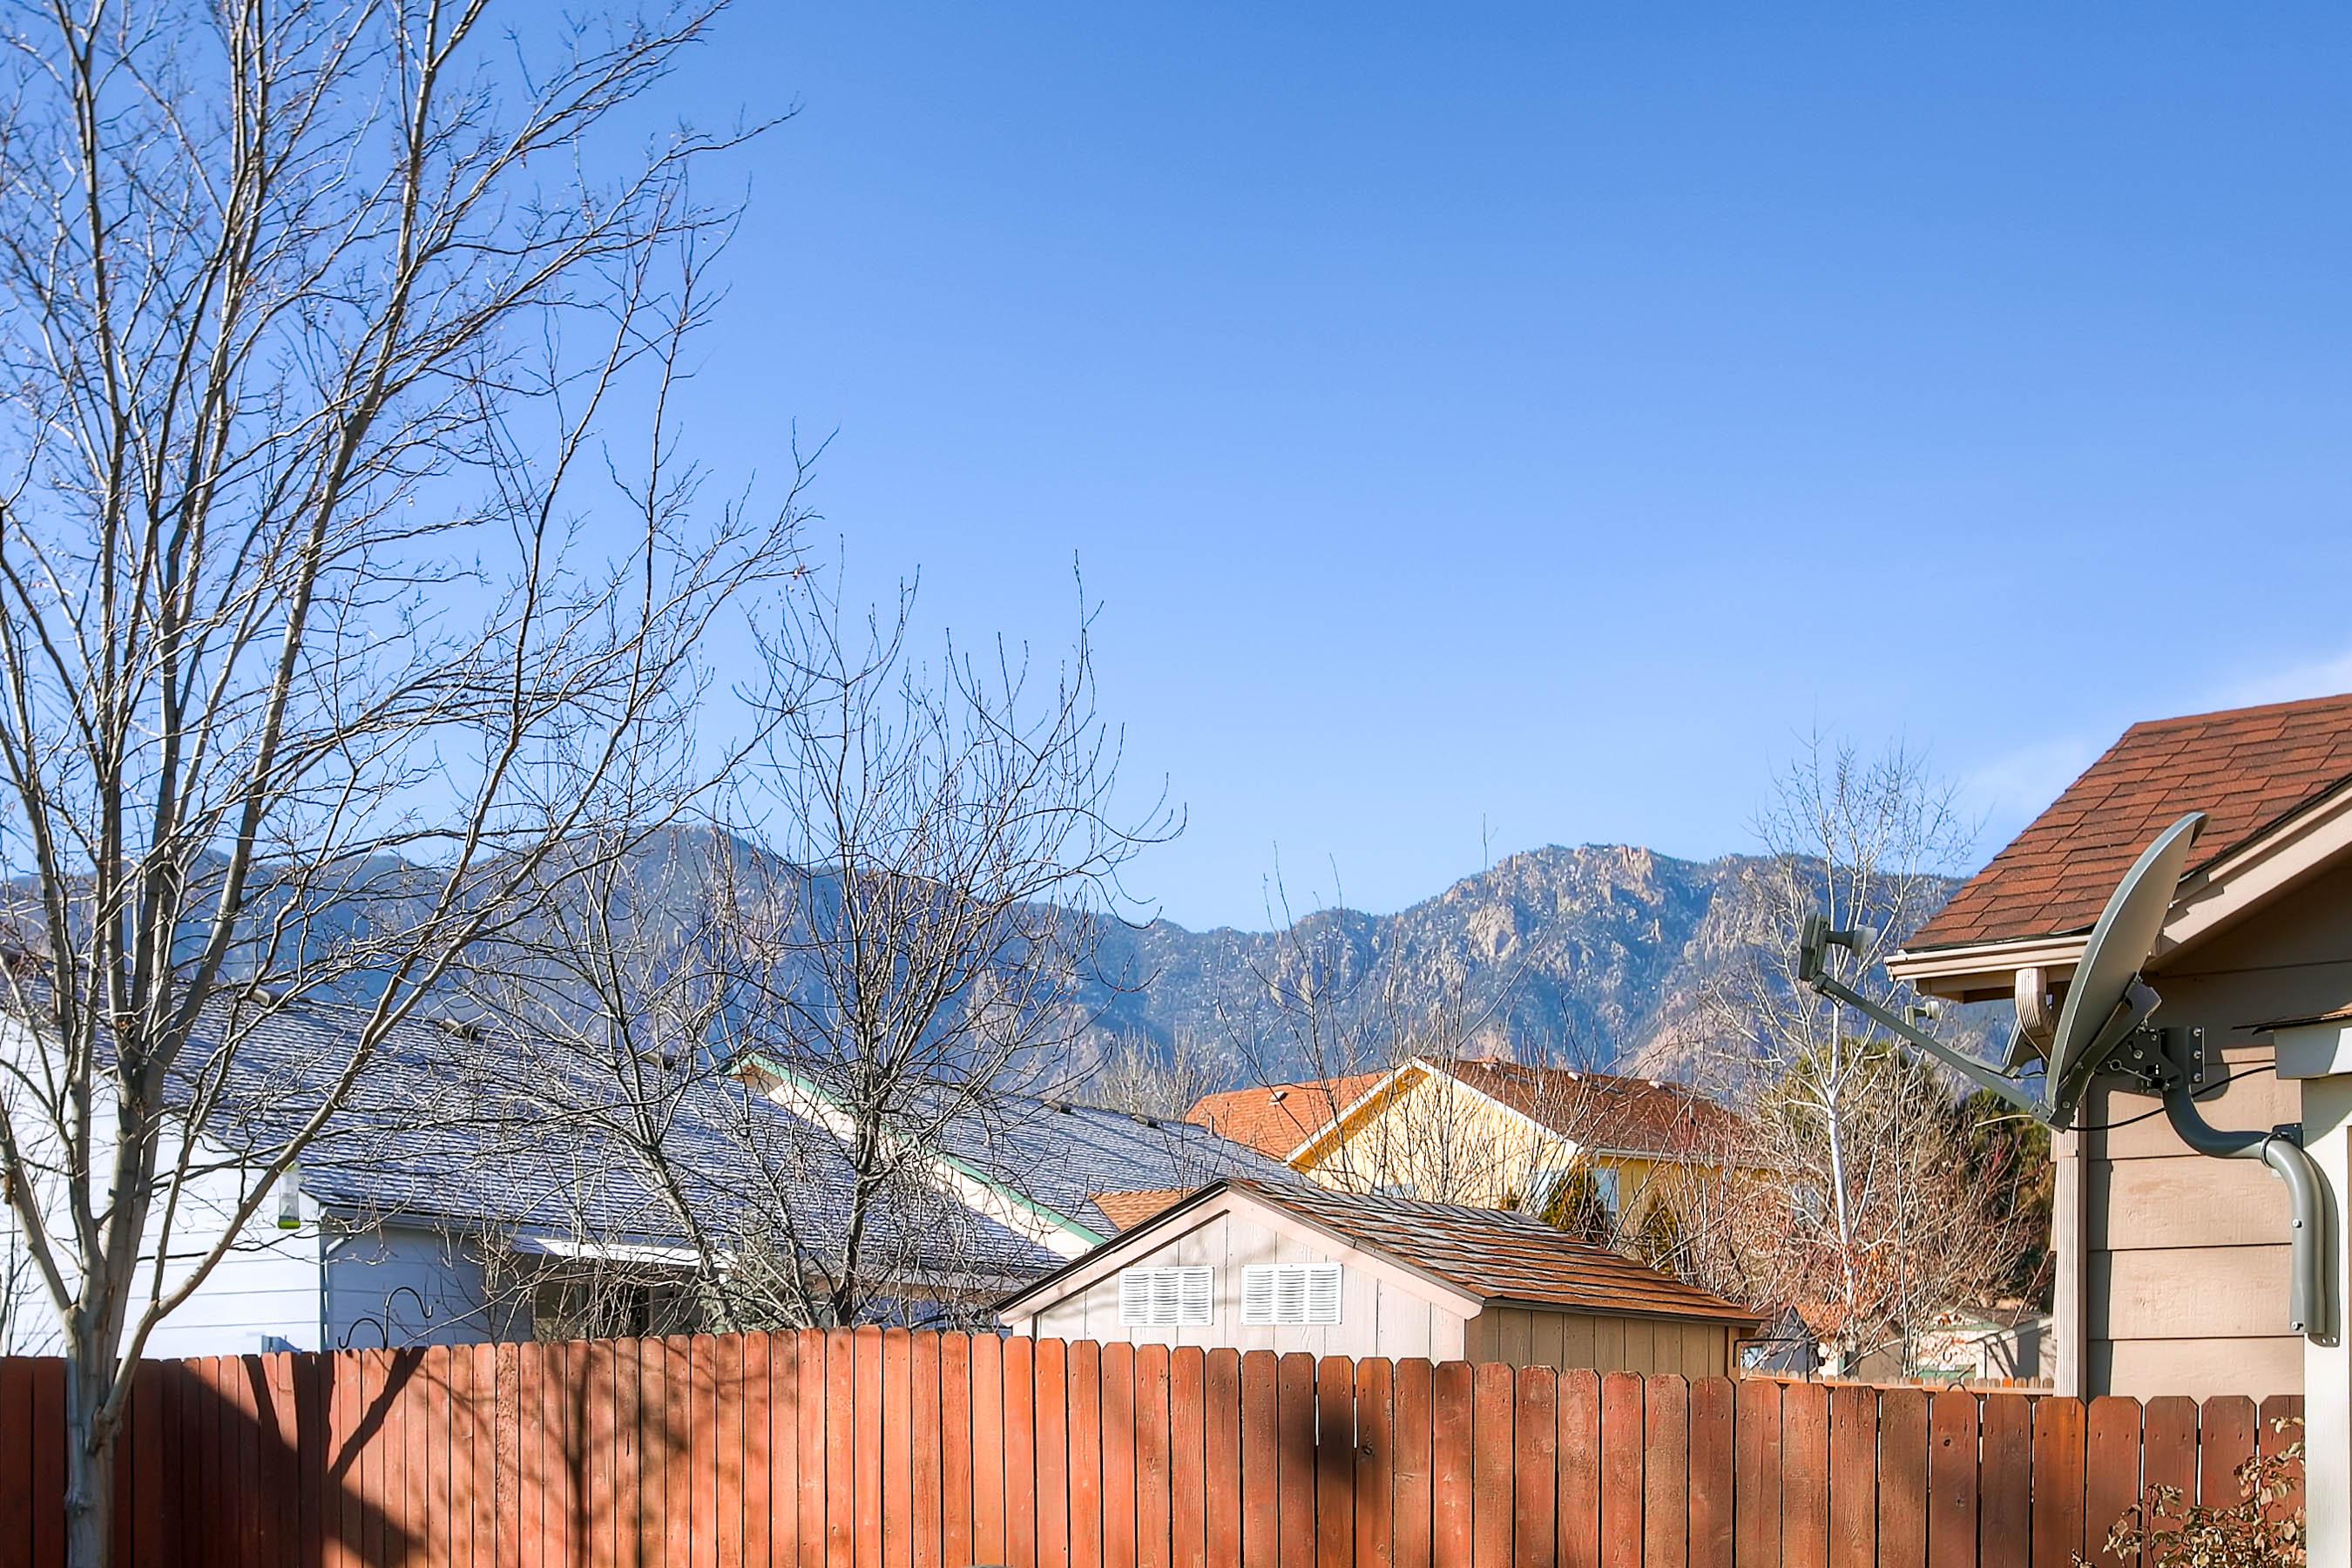 1445 Gumwood Dr Colorado-print-028-Views-2700x1800-300dpi